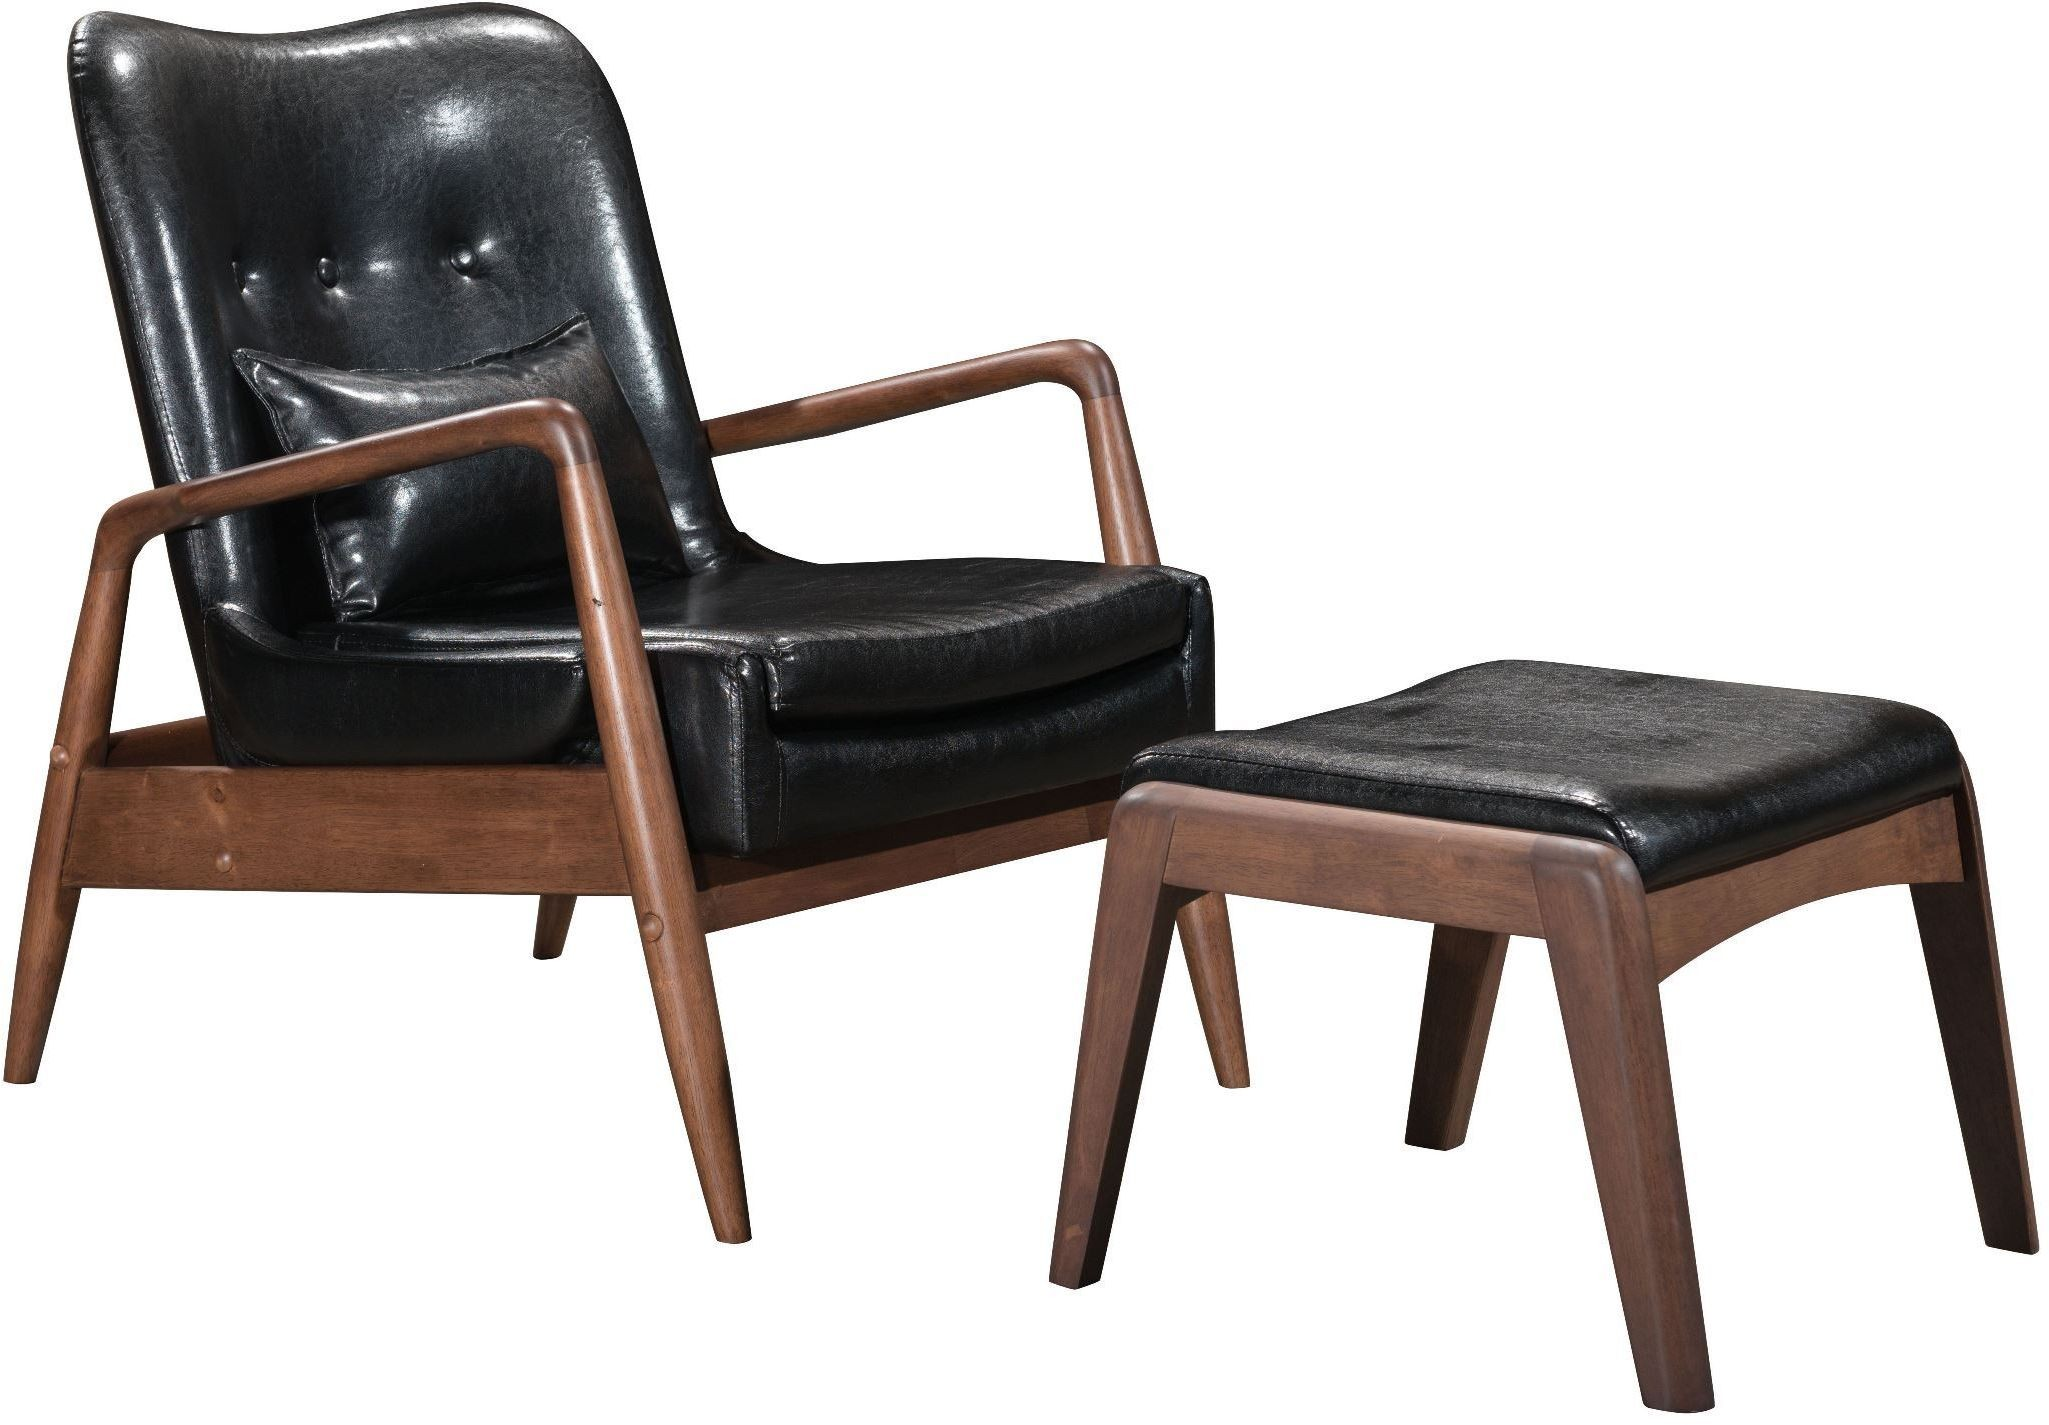 bully lounge chair ottoman black